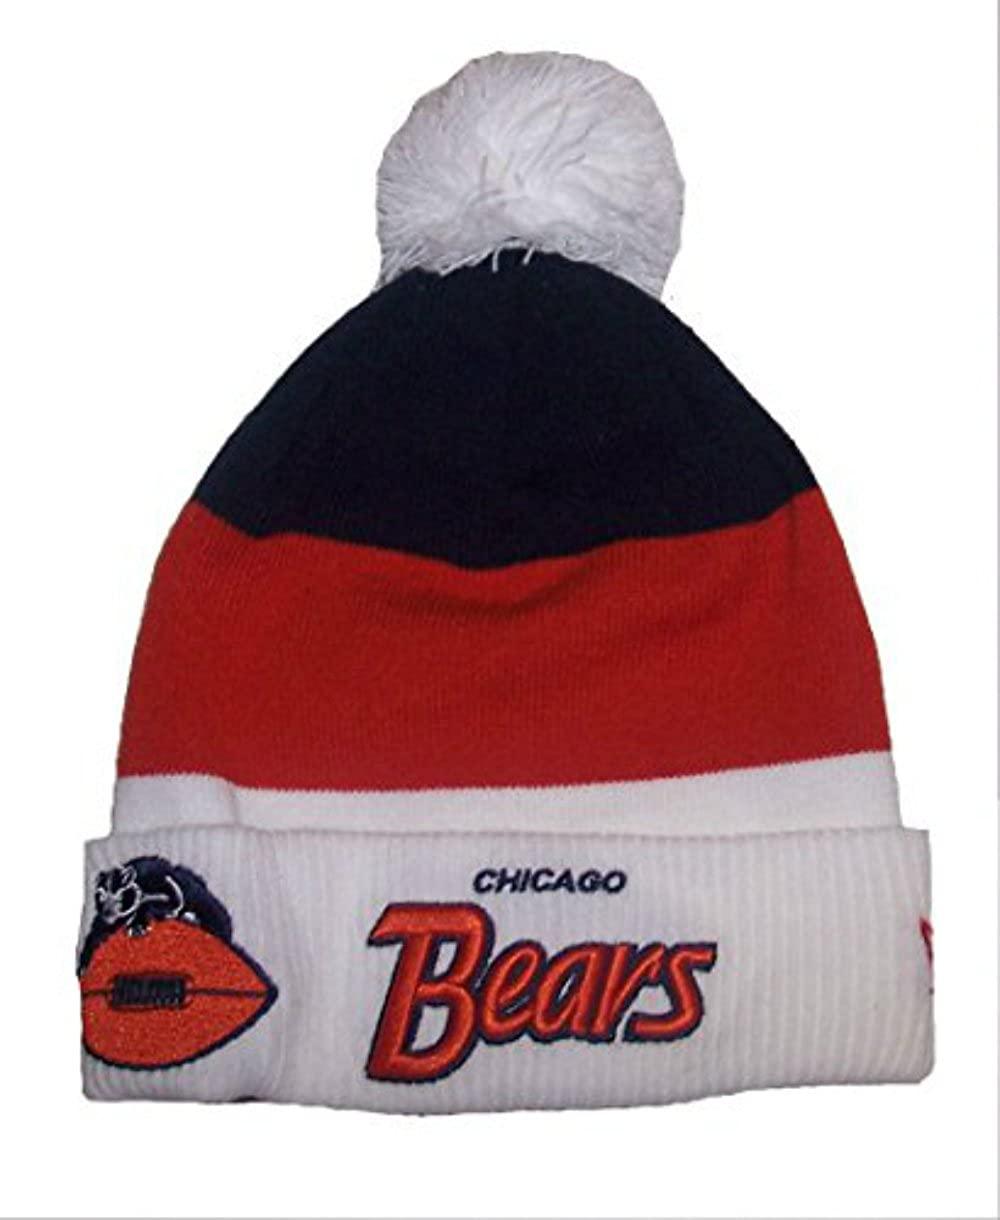 Genuine Merchandise Chicago Bears New Era Gridiron Knit Cuff Scriptor Beanie w/Pom Tri Tone Hat Cap